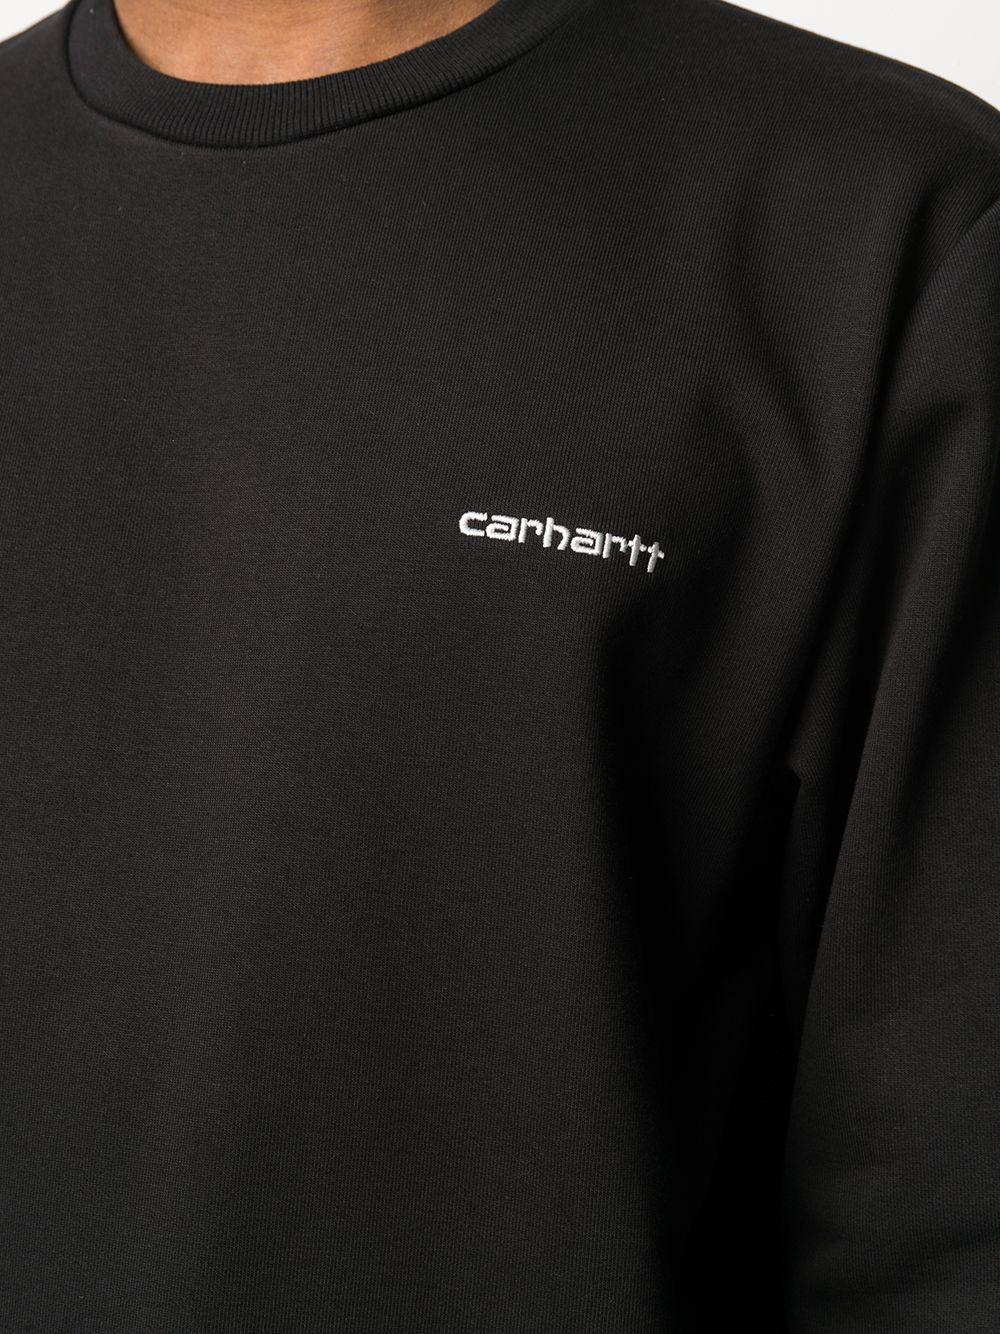 script embroidery sweatshirt man black in cotton CARHARTT WIP | Sweatshirts | I02467889.91